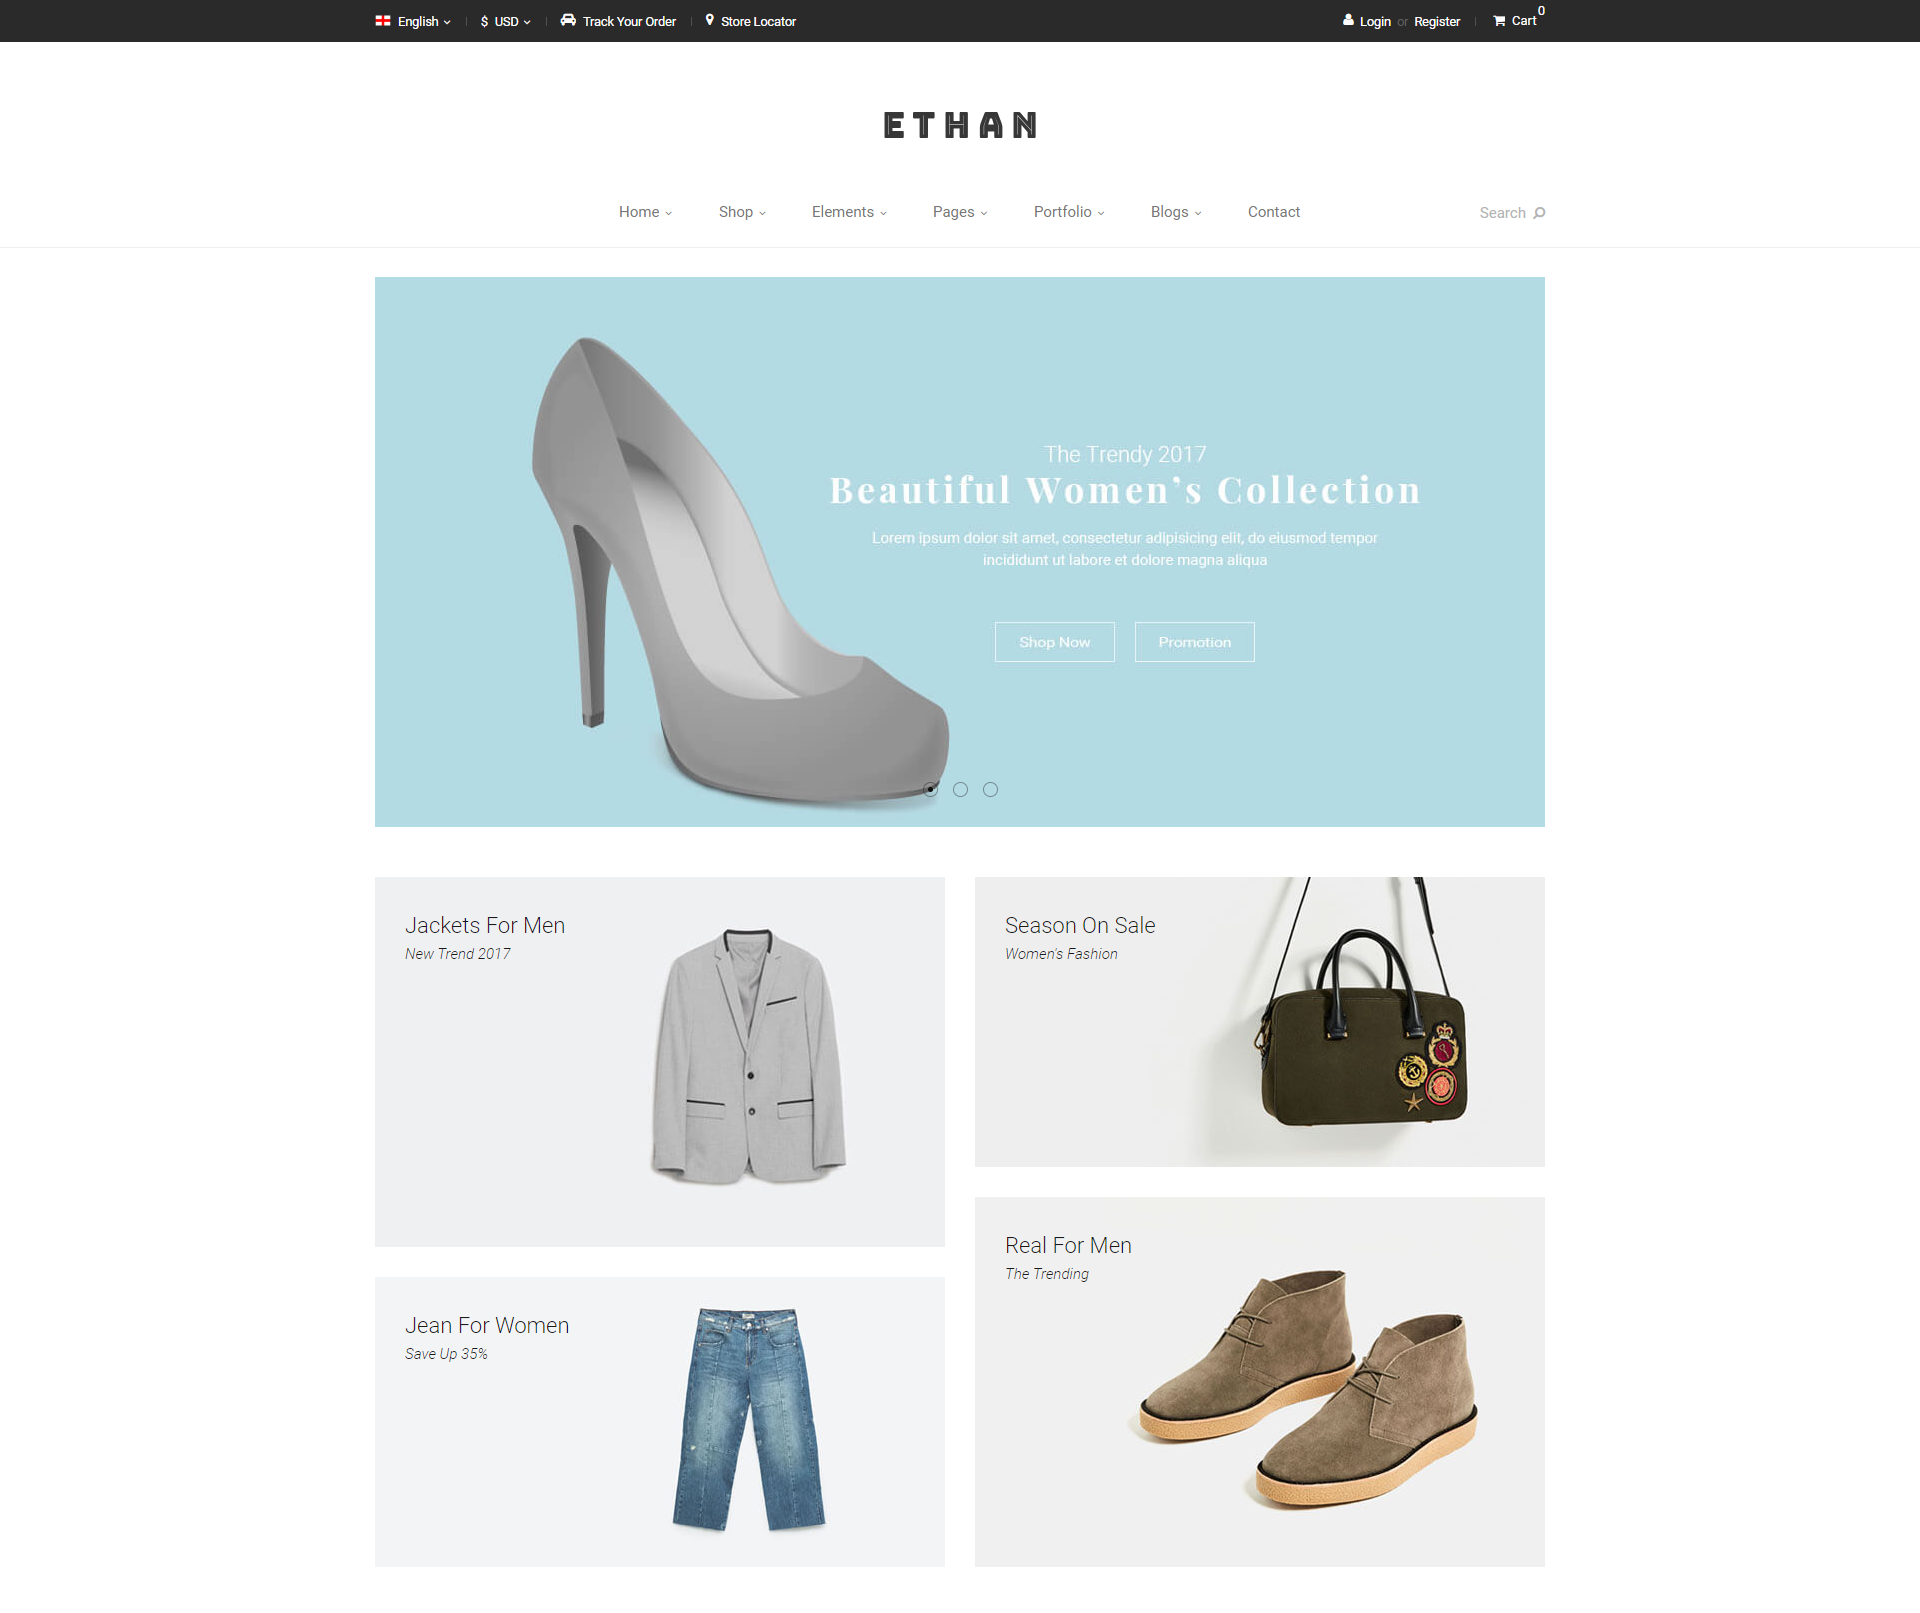 ethan theme homepage